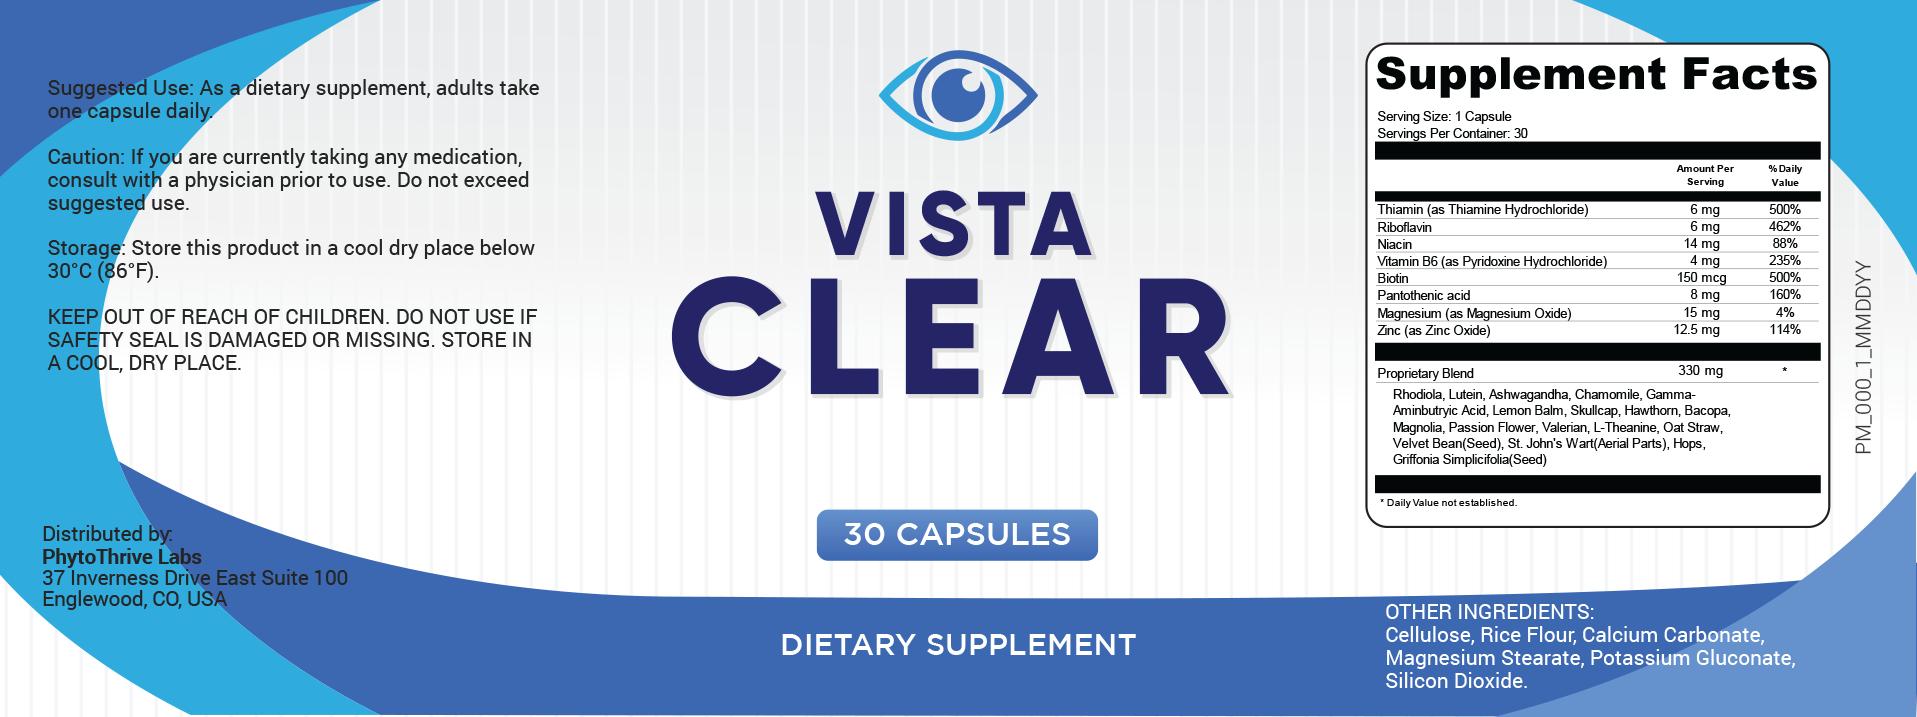 Vista Clear Ingredients Label